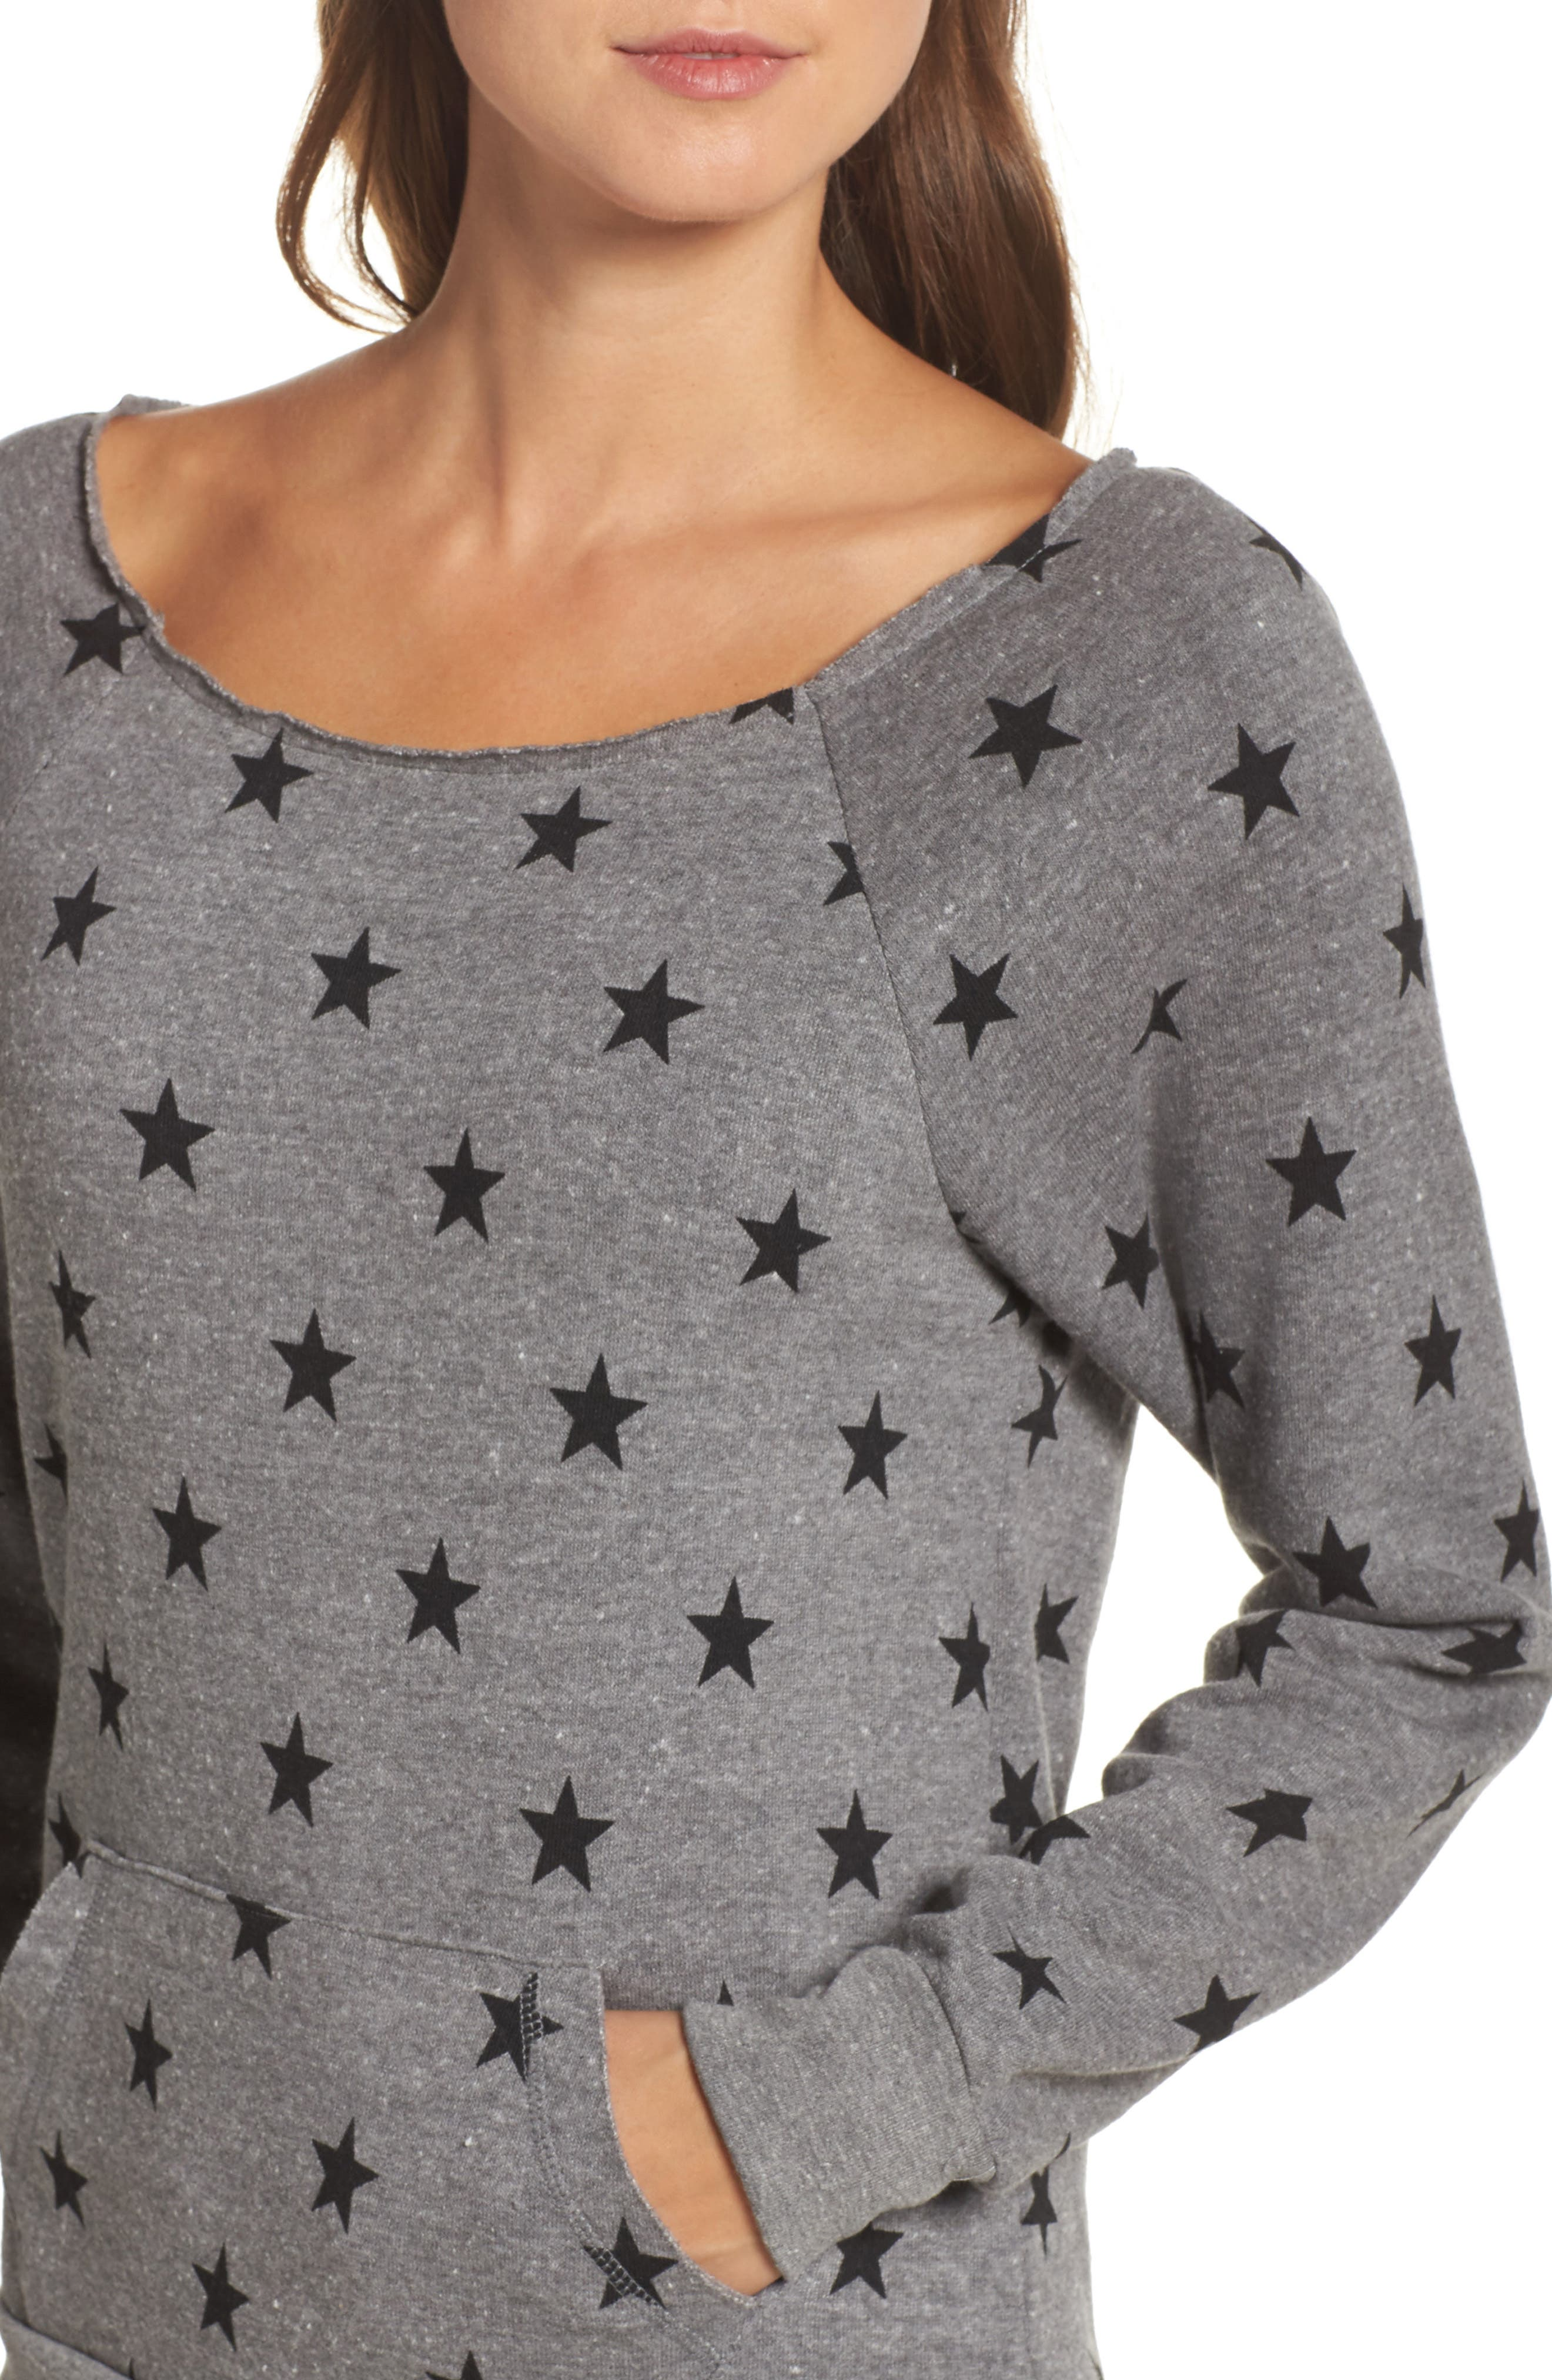 Maniac Camo Fleece Sweatshirt,                             Alternate thumbnail 4, color,                             Eco Grey Stars